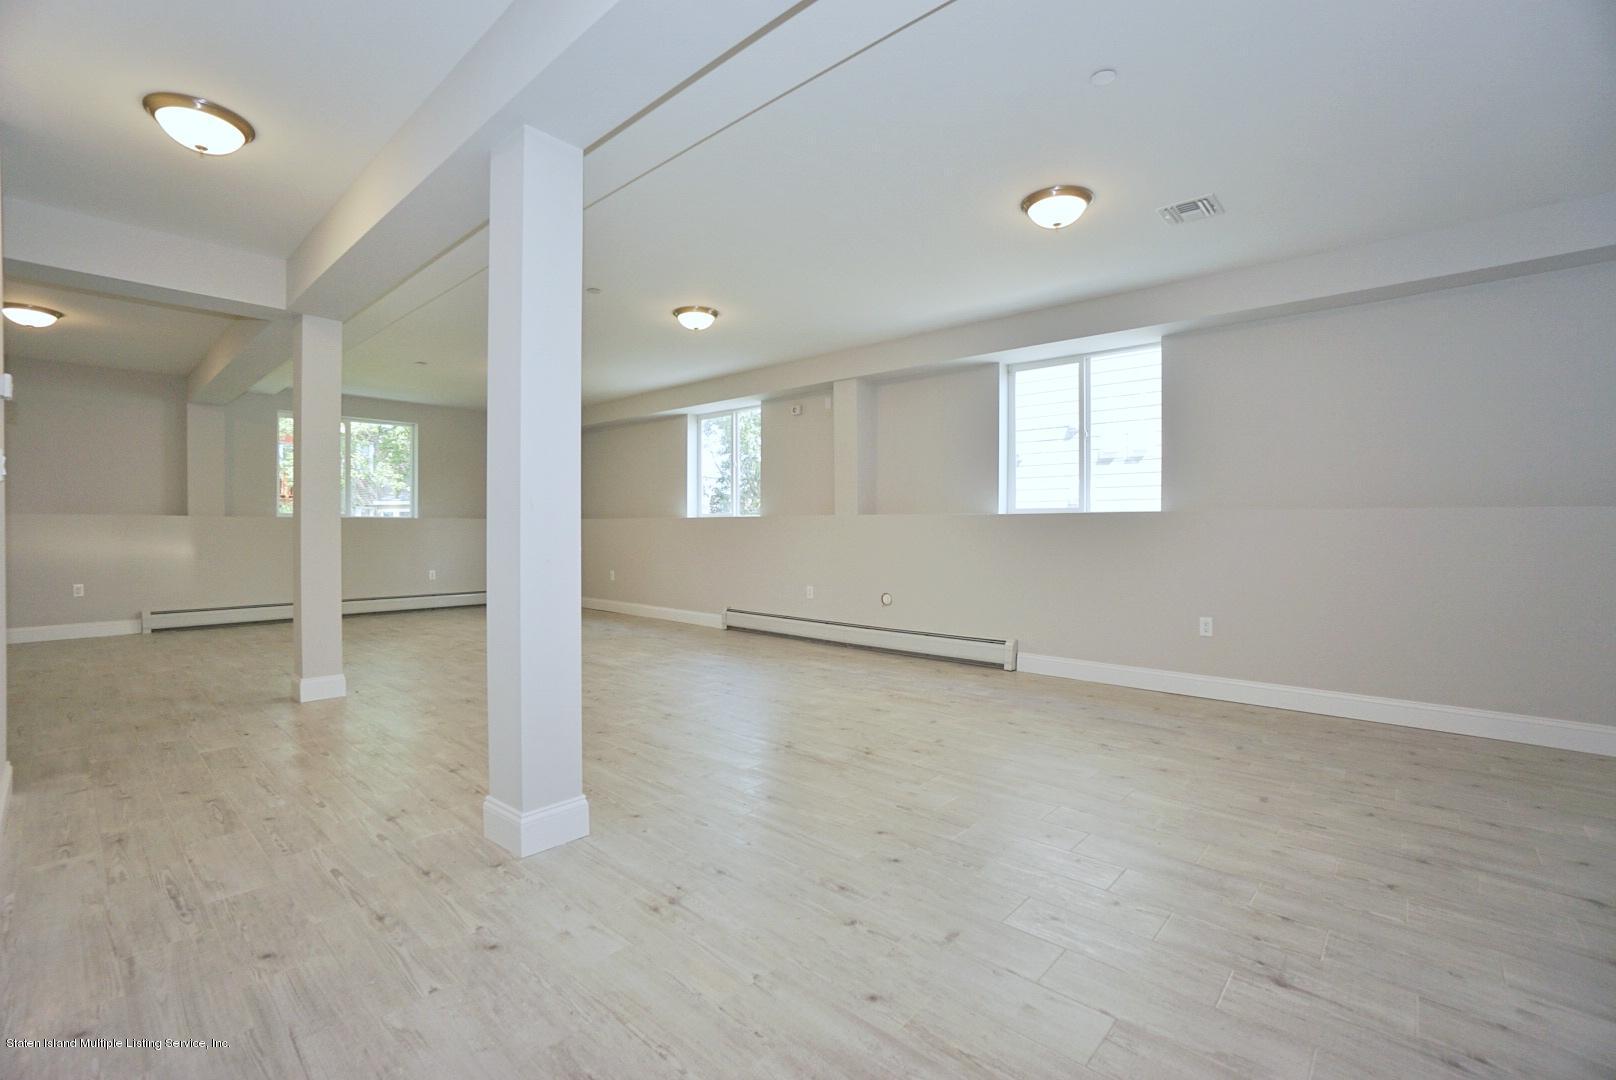 Single Family - Detached 170 Fairview Avenue  Staten Island, NY 10314, MLS-1126684-55